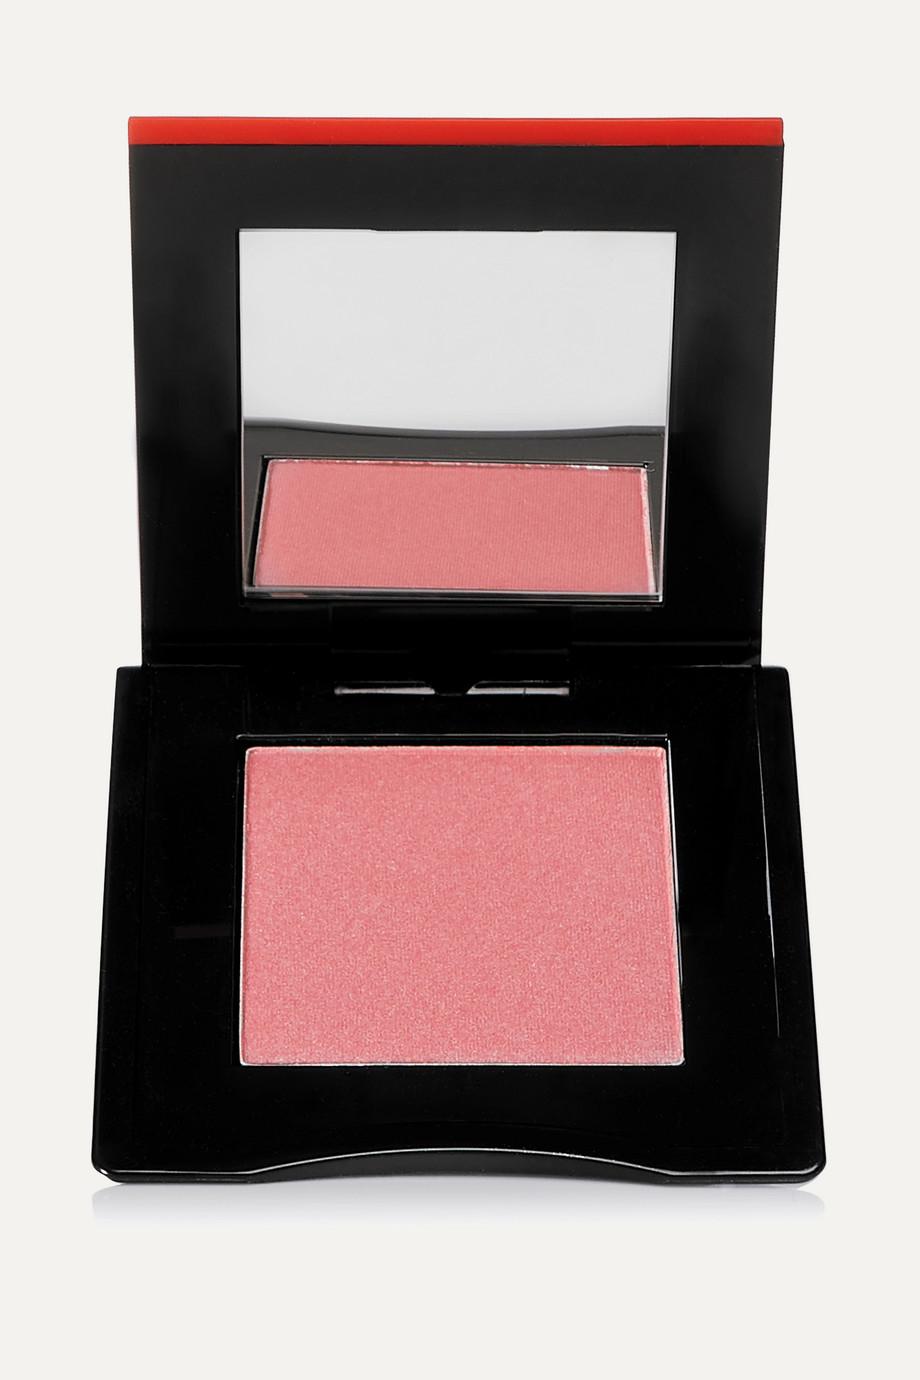 Shiseido InnerGlow CheekPowder – Floating Rose 03 – Rouge